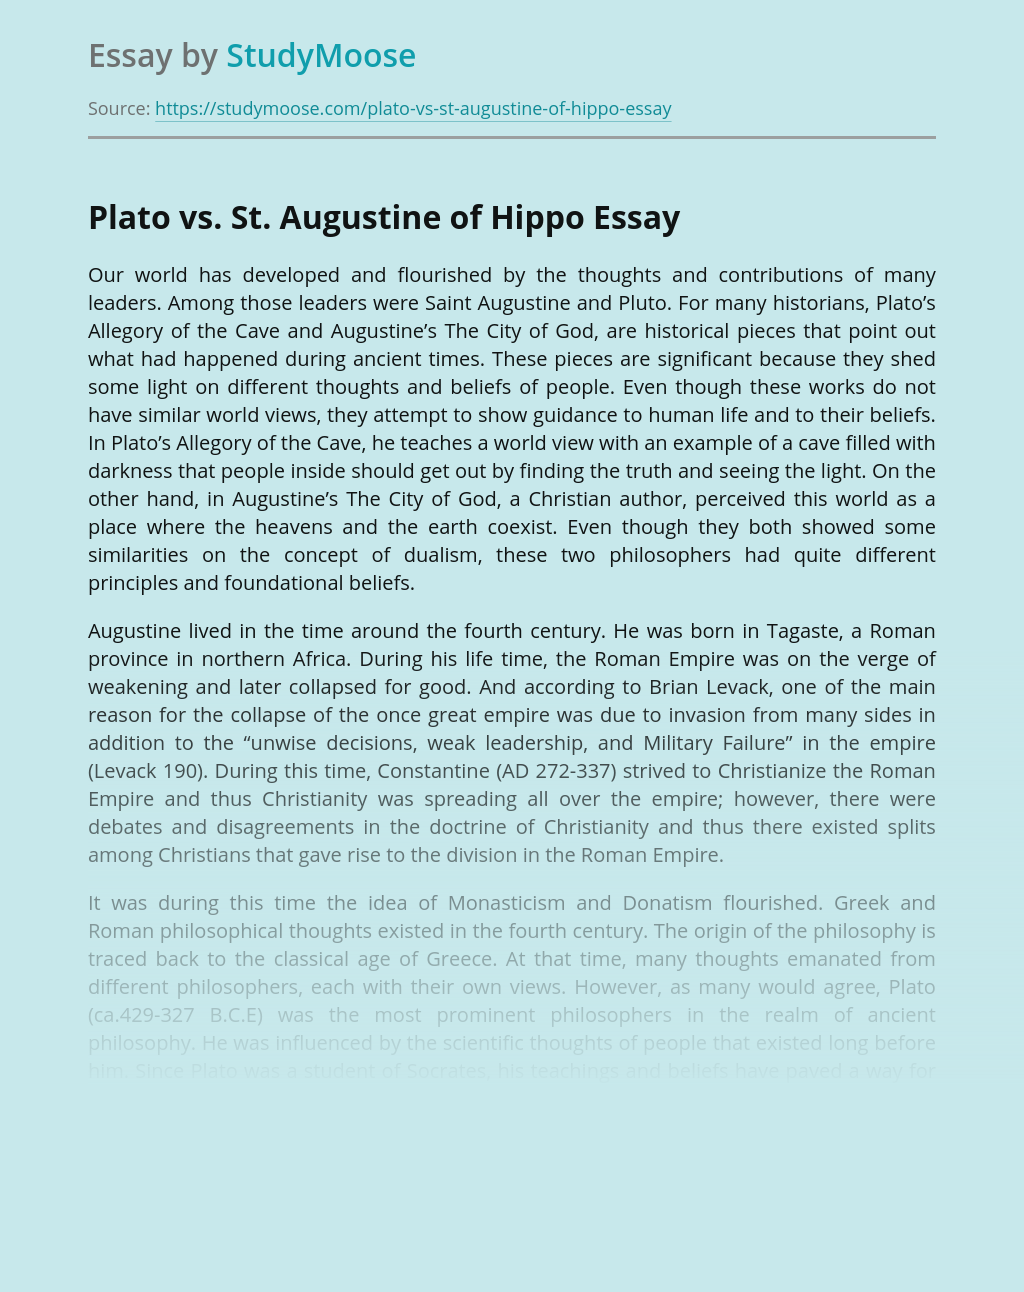 Plato vs. St. Augustine of Hippo